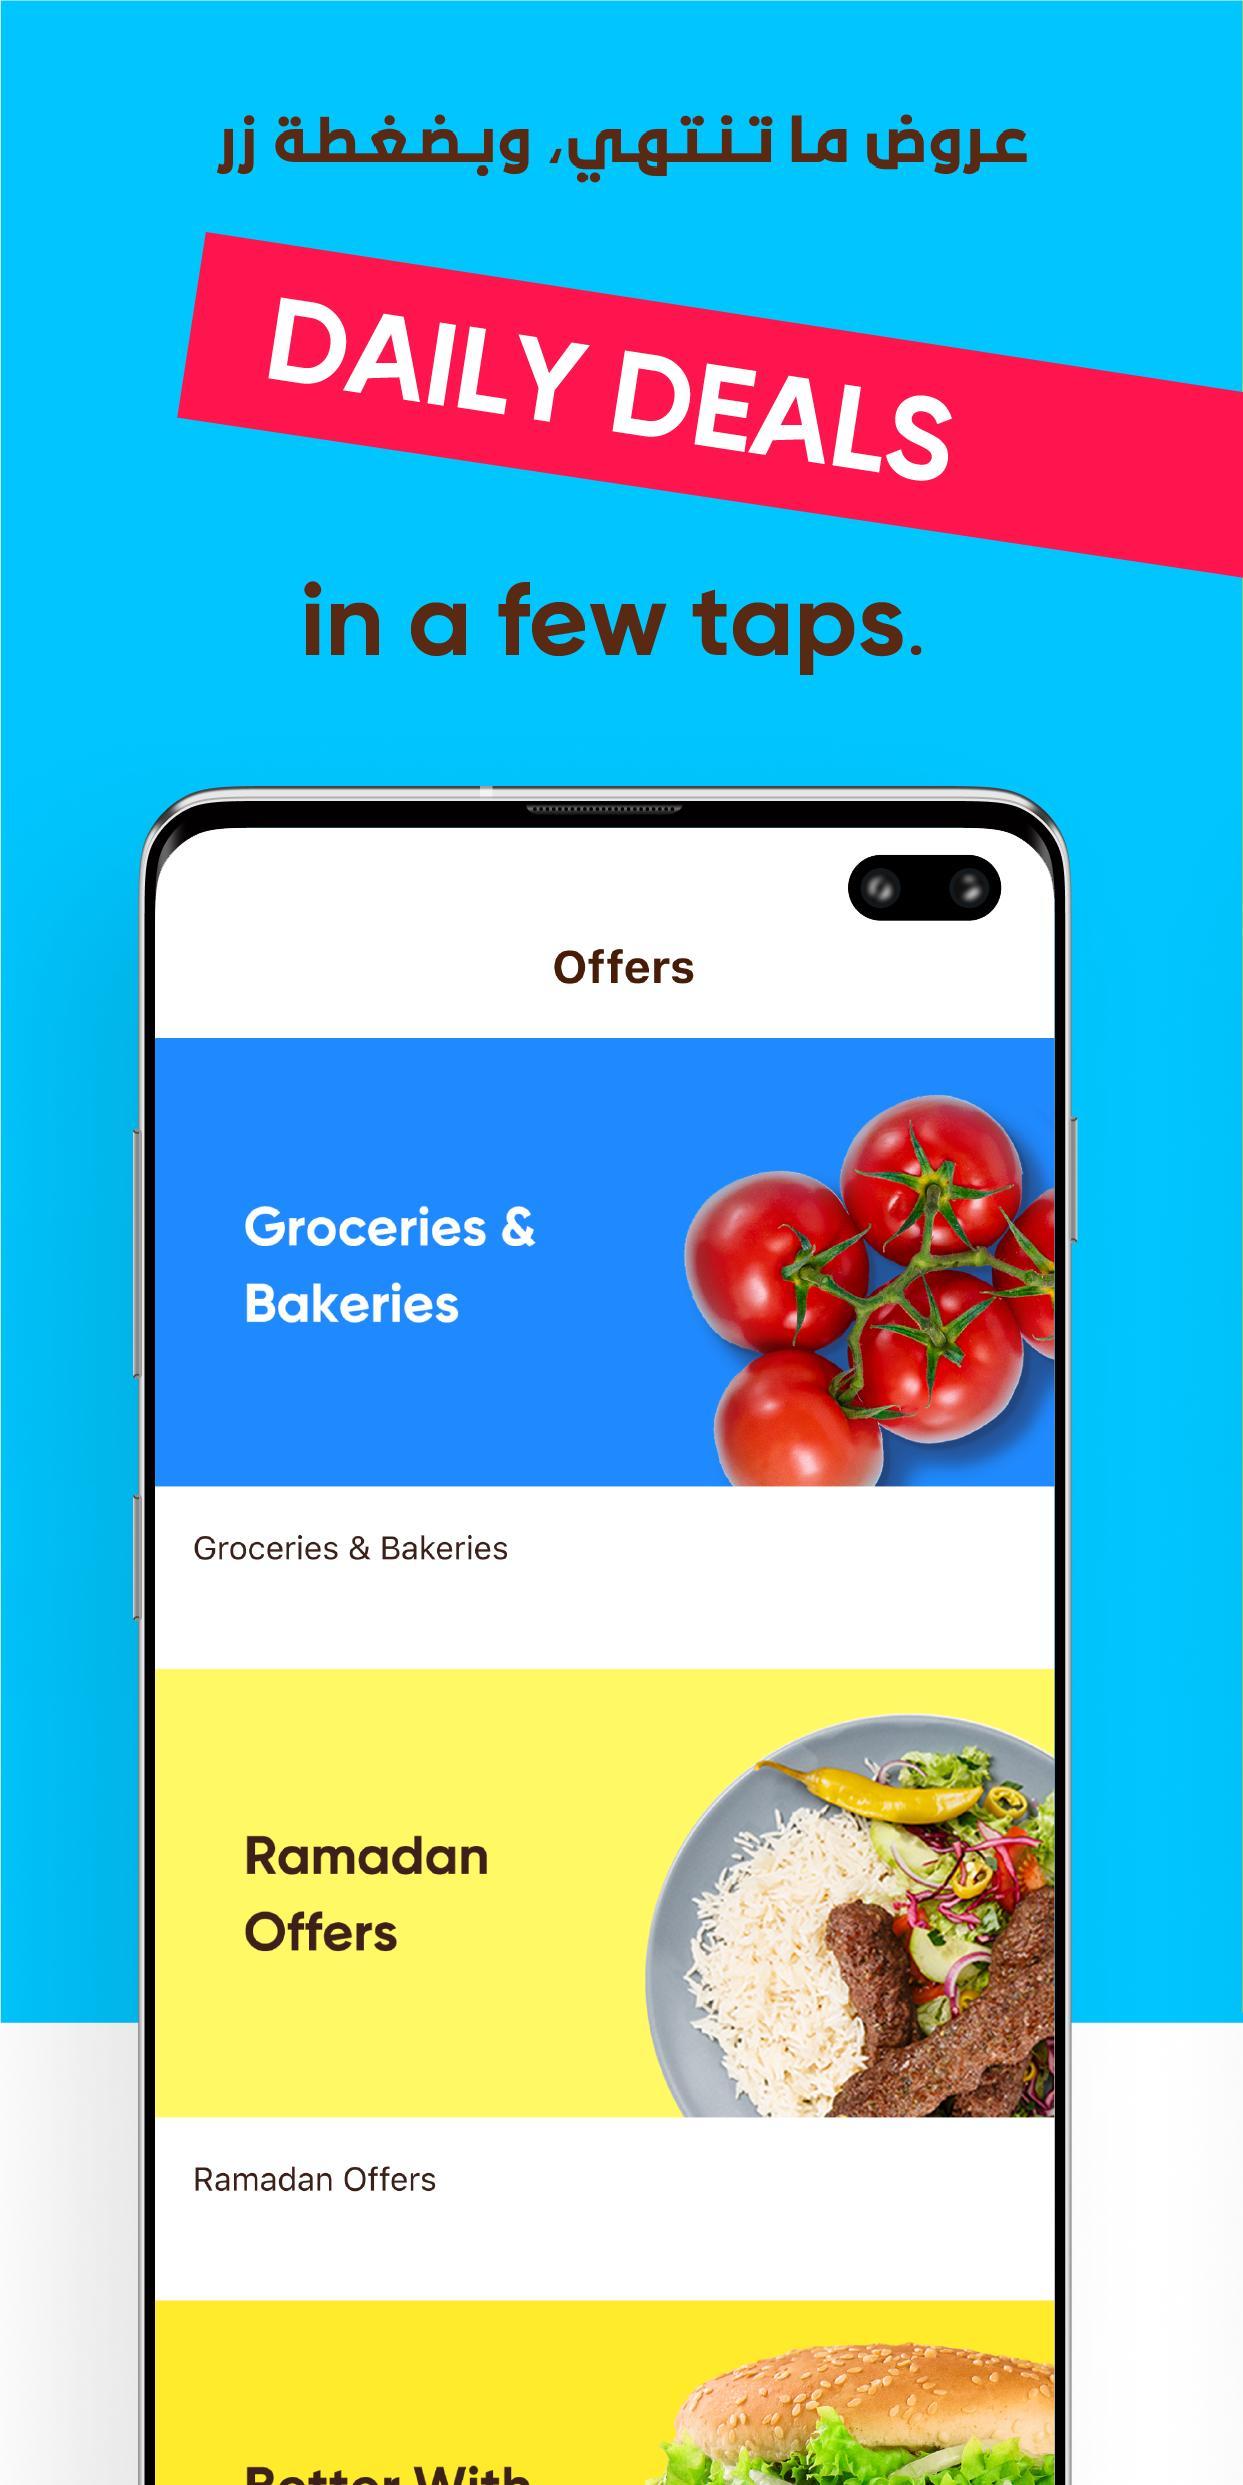 HungerStation Food, Groceries Delivery & More 8.0.1 Screenshot 4